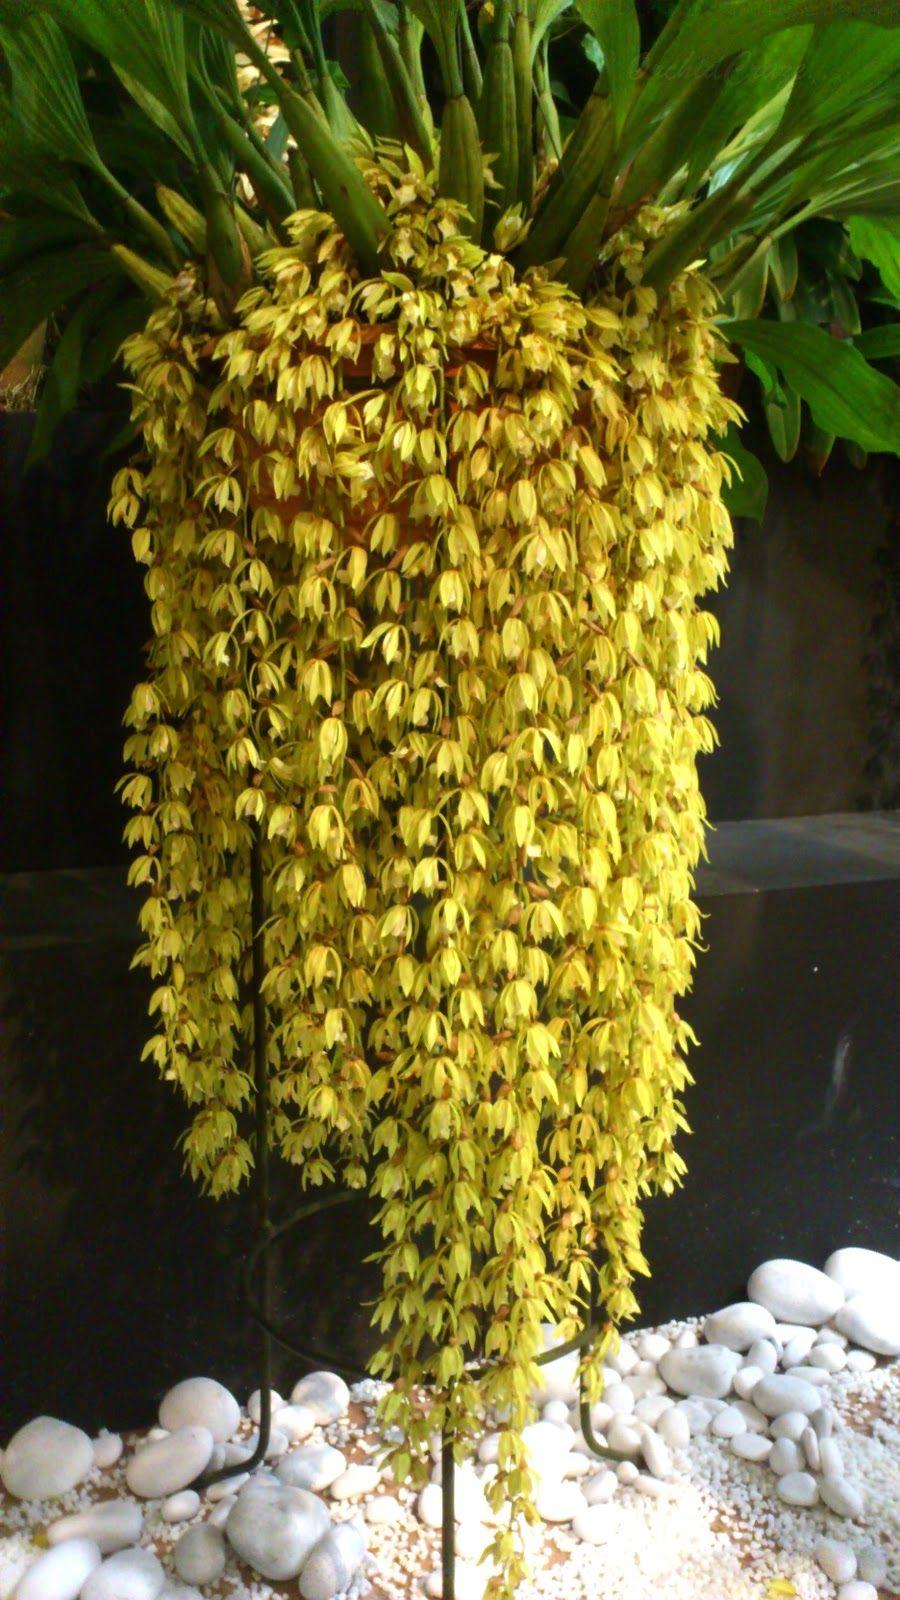 Orchidcraze maha orchid show ideas for the house pinterest